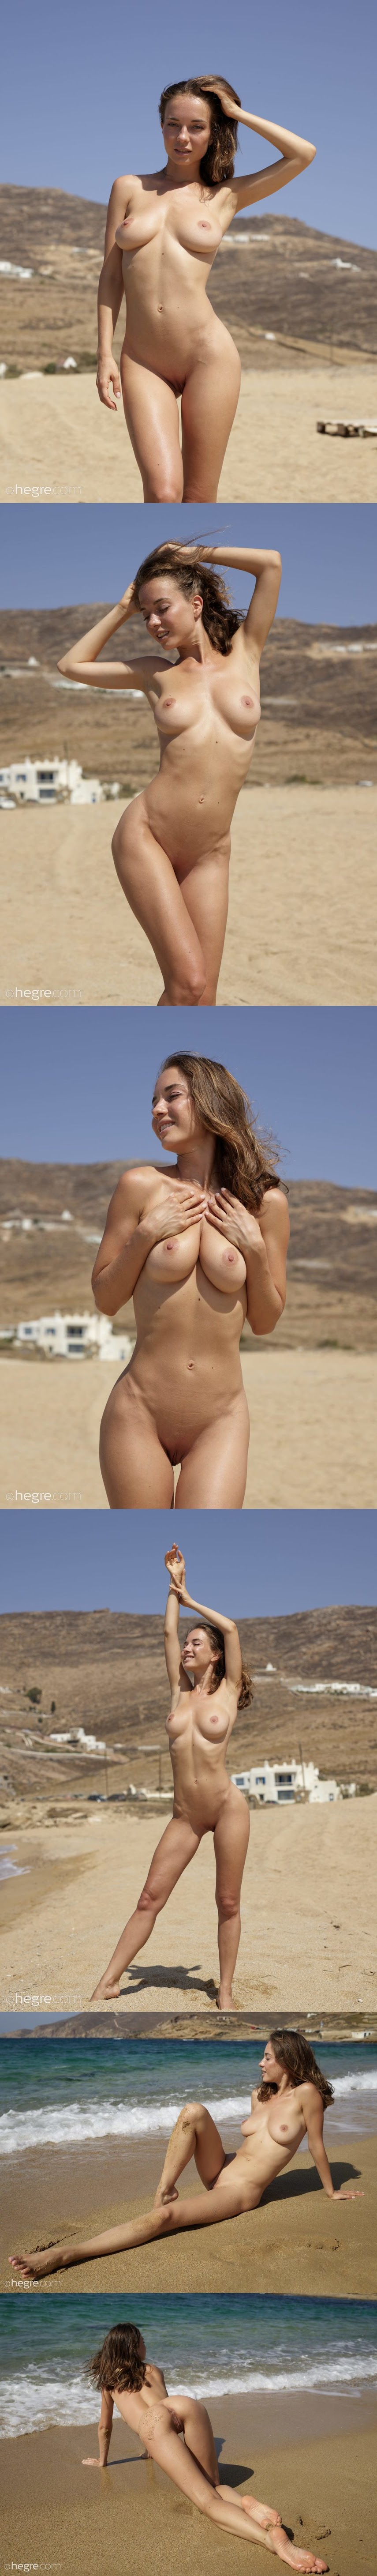 1-[Art] Natalia A - Beautiful Beach Babe sexy girls image jav